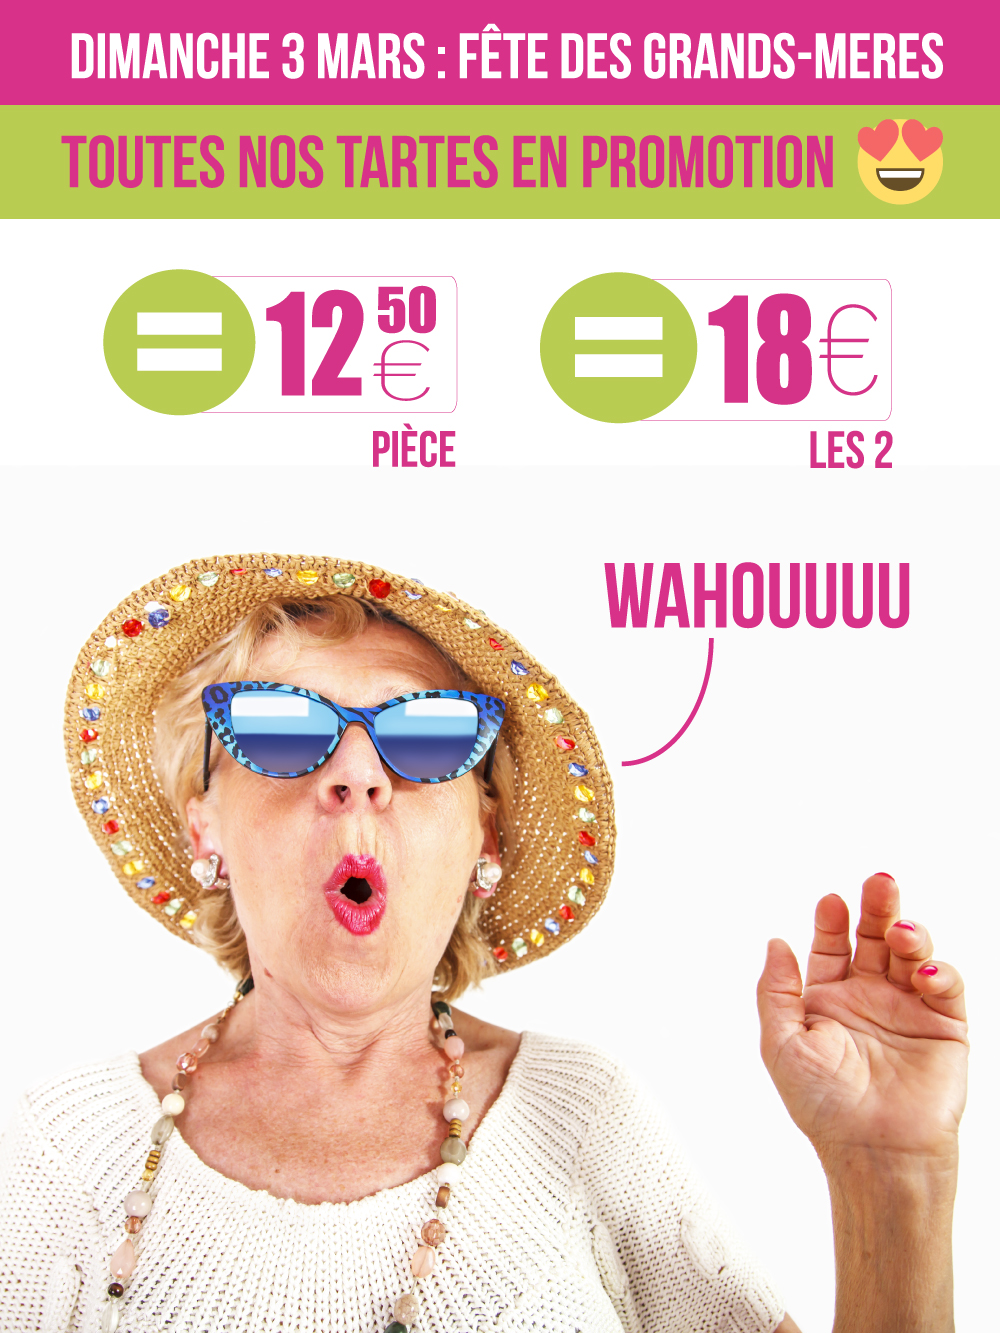 A1-TARTES-en-PROMO-+-WAHOUU-FETEDESGRANDSMERES-2019-LAMIEDEPAIN